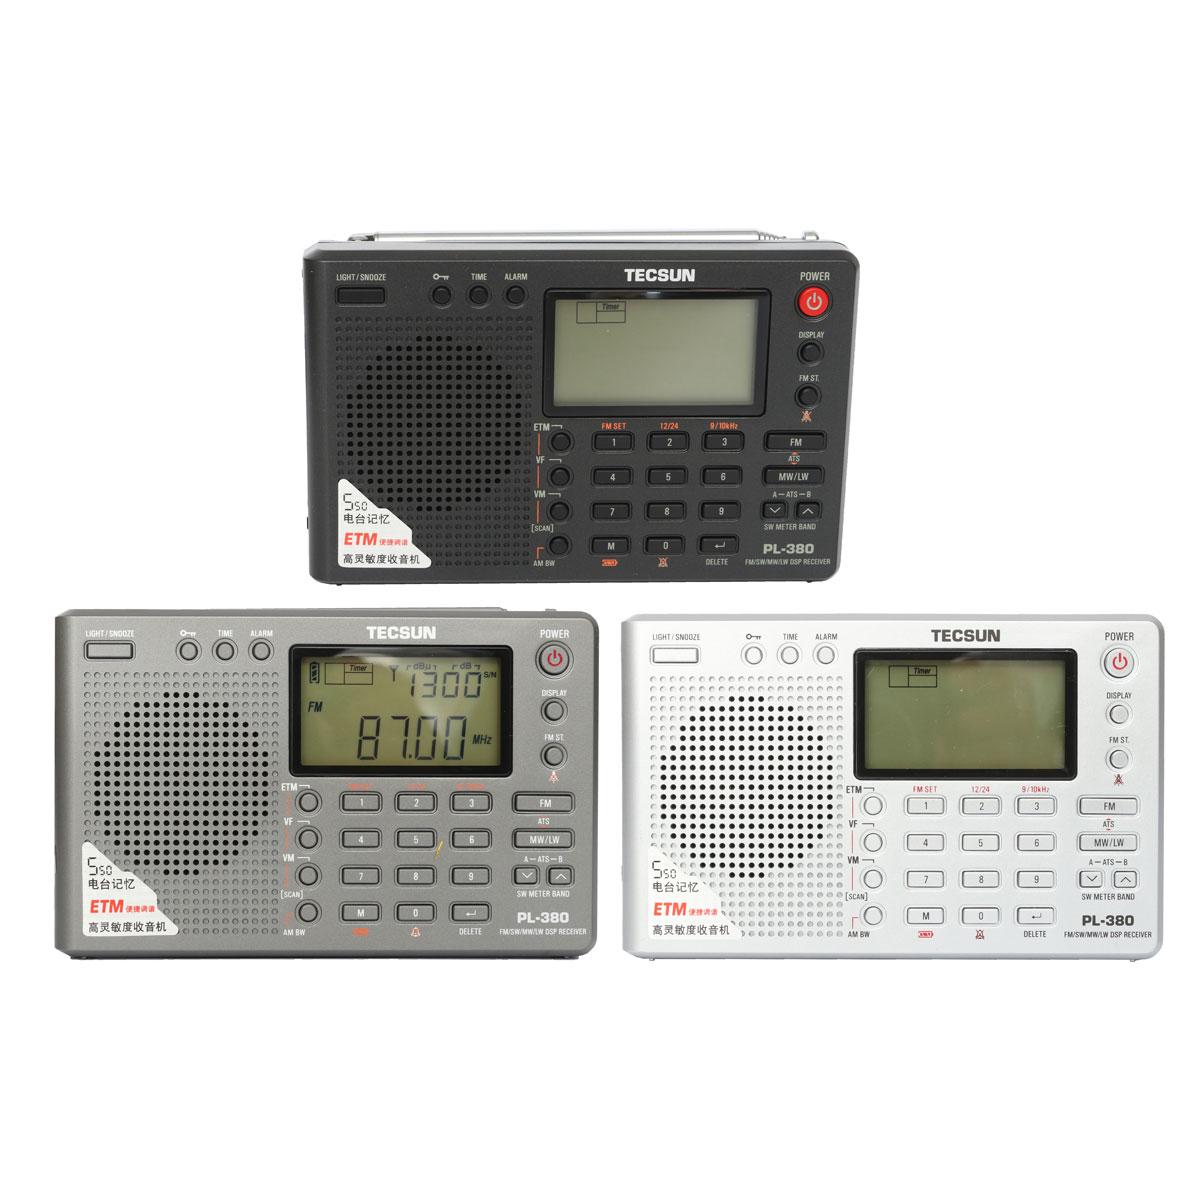 Tragbares Audio & Video Tecsun Pl-380 Dsp Pll Fm Mw Sw Lw Digital Stereo Radio Welt-band Empfänger Neue 135x86 X 29mm 3 Farben 7 Tuning Modus Wählbar Clear-Cut-Textur